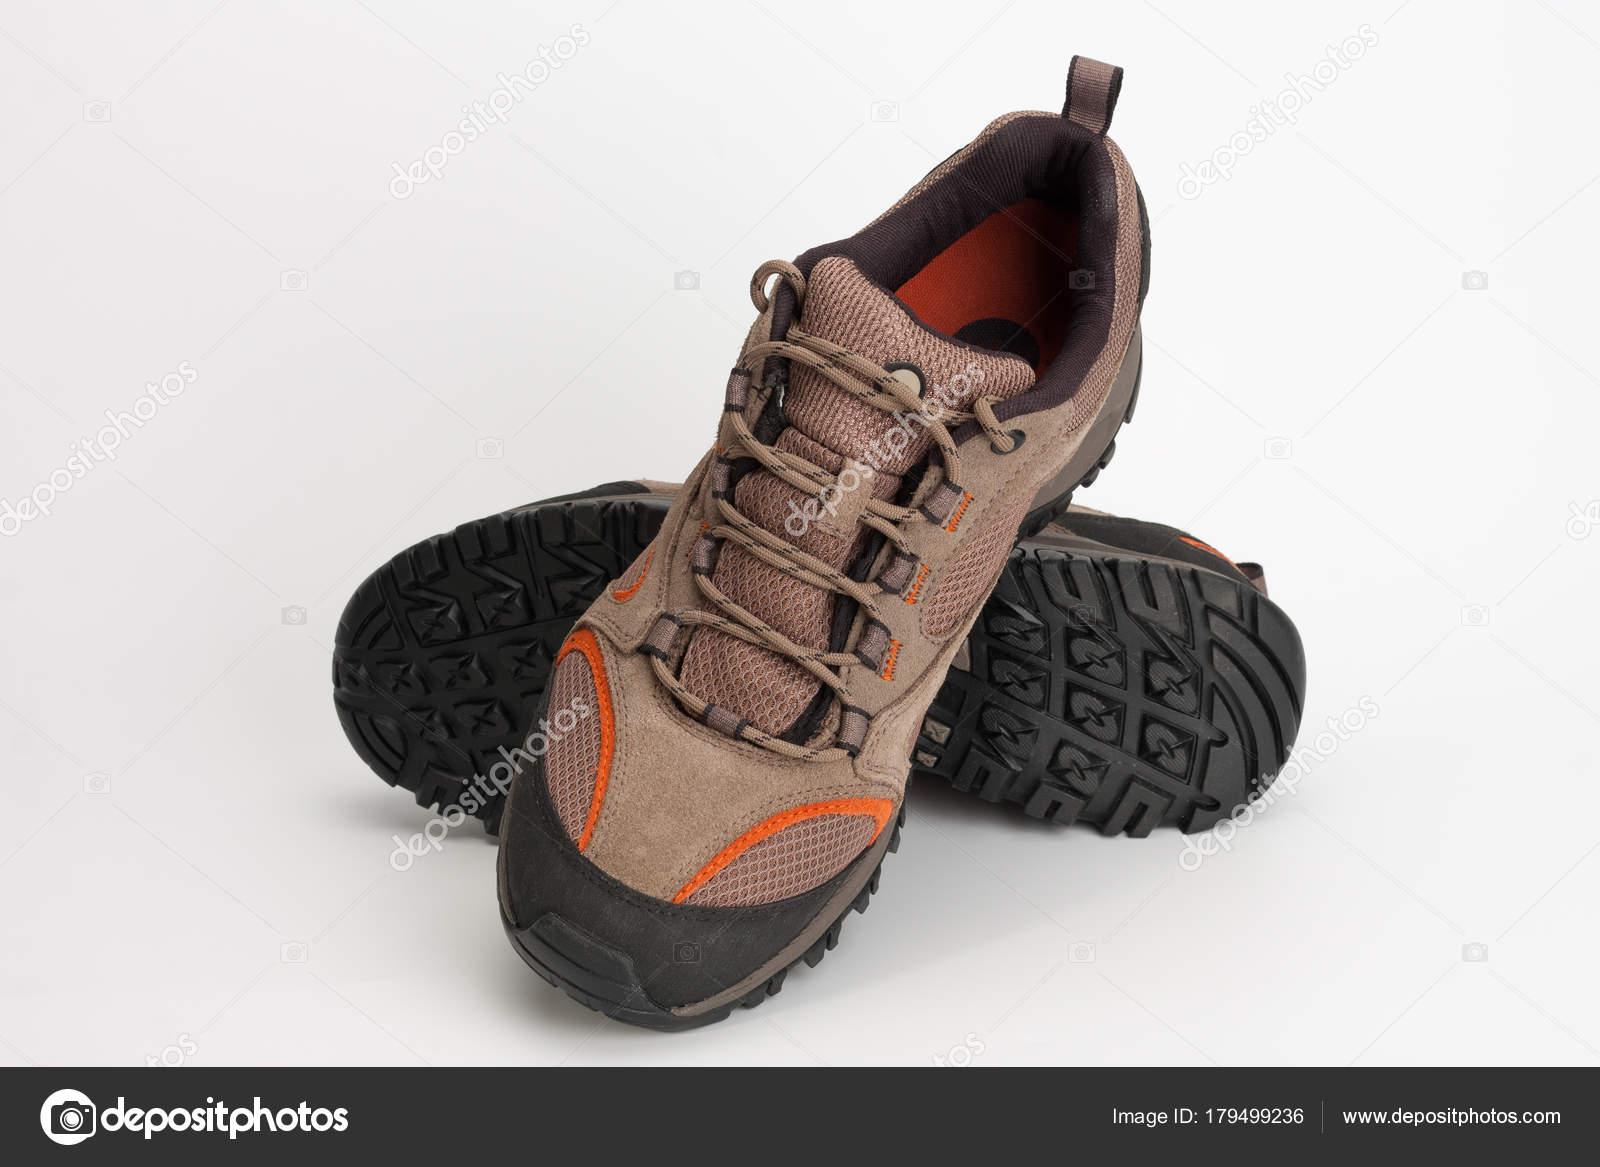 f8b7b5752c5 Υπαίθρια παπούτσια για άνδρα για πεζοπορία, πεζοπορία, αναρρίχηση ...